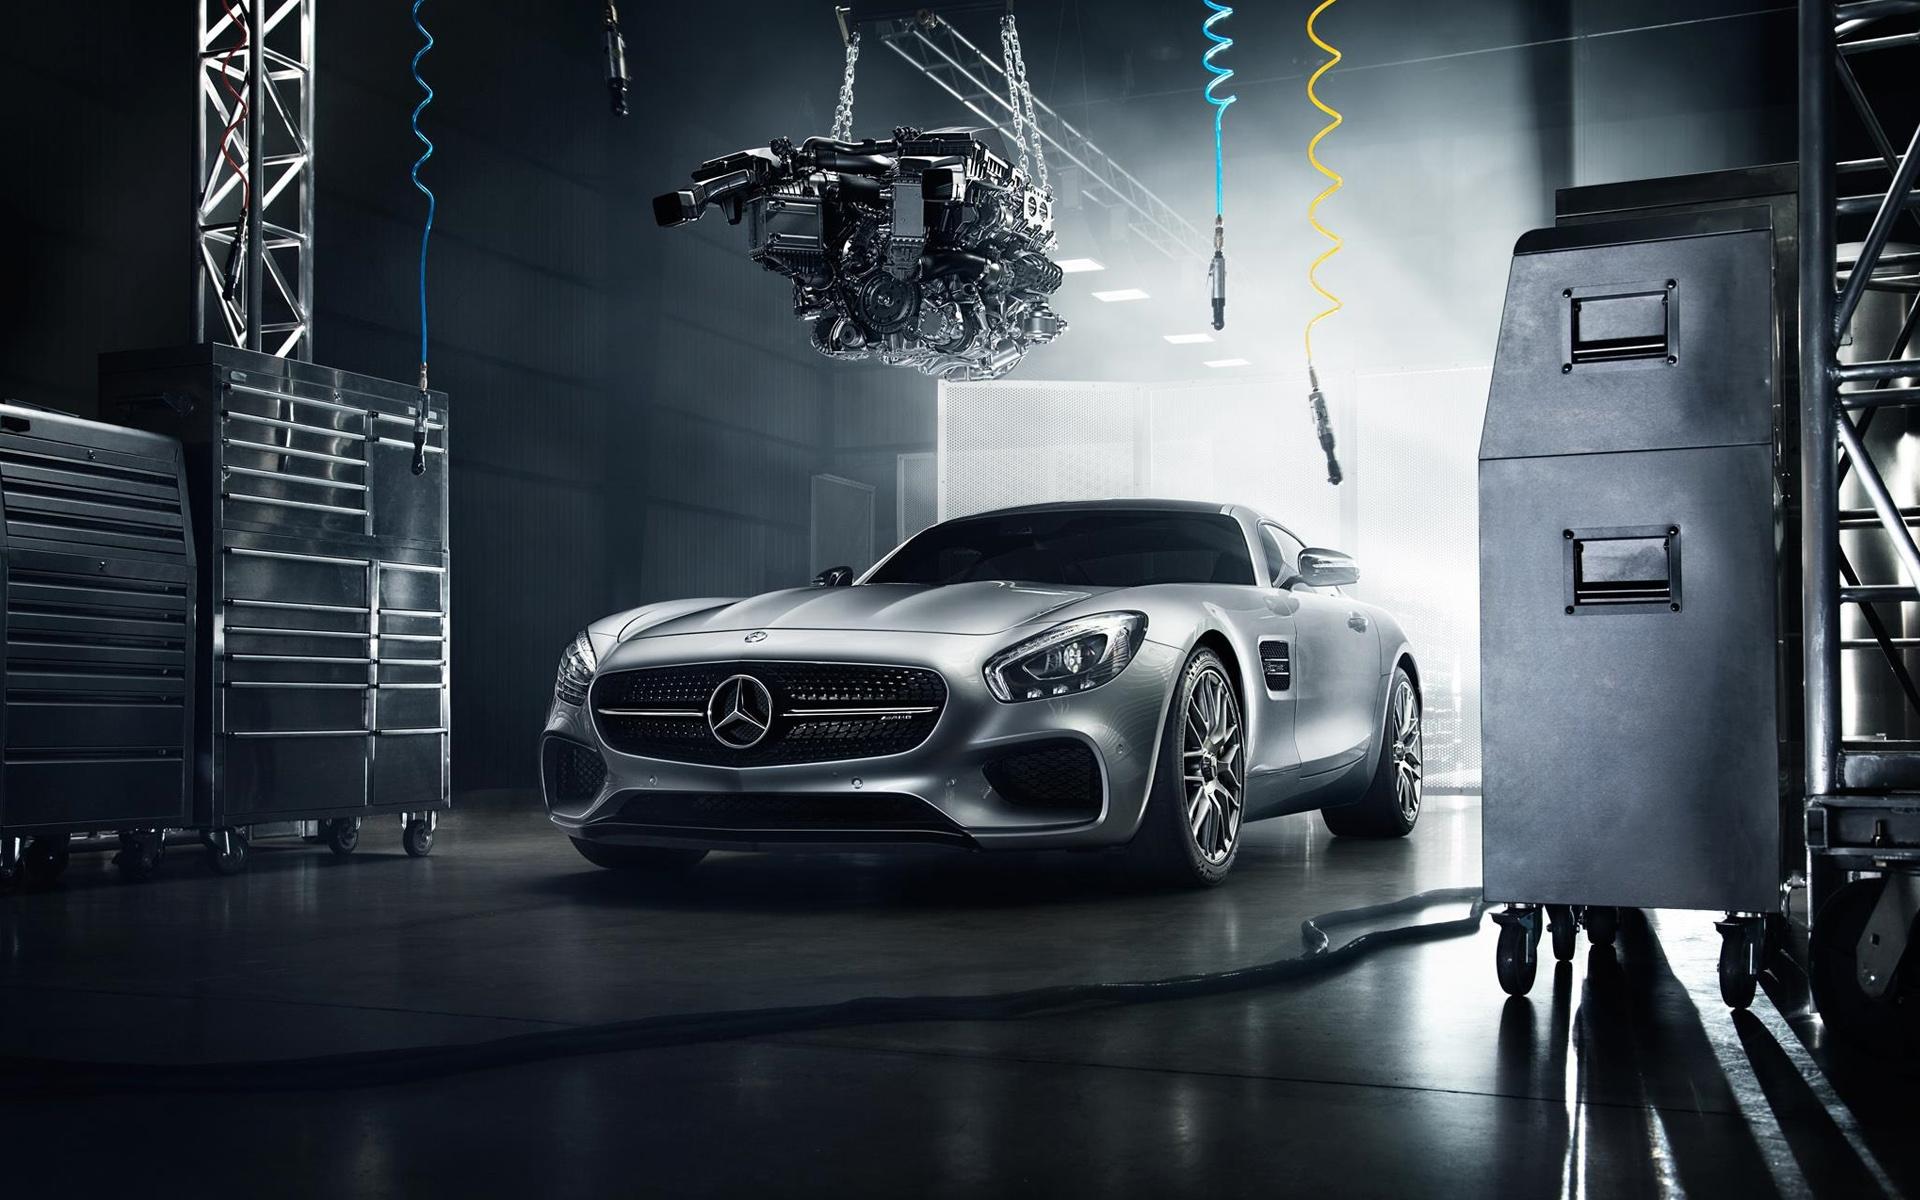 Mercedes amg gt s 2015 wallpaper hd car wallpapers - 2016 Mercedes Benz Amg Gt S 2